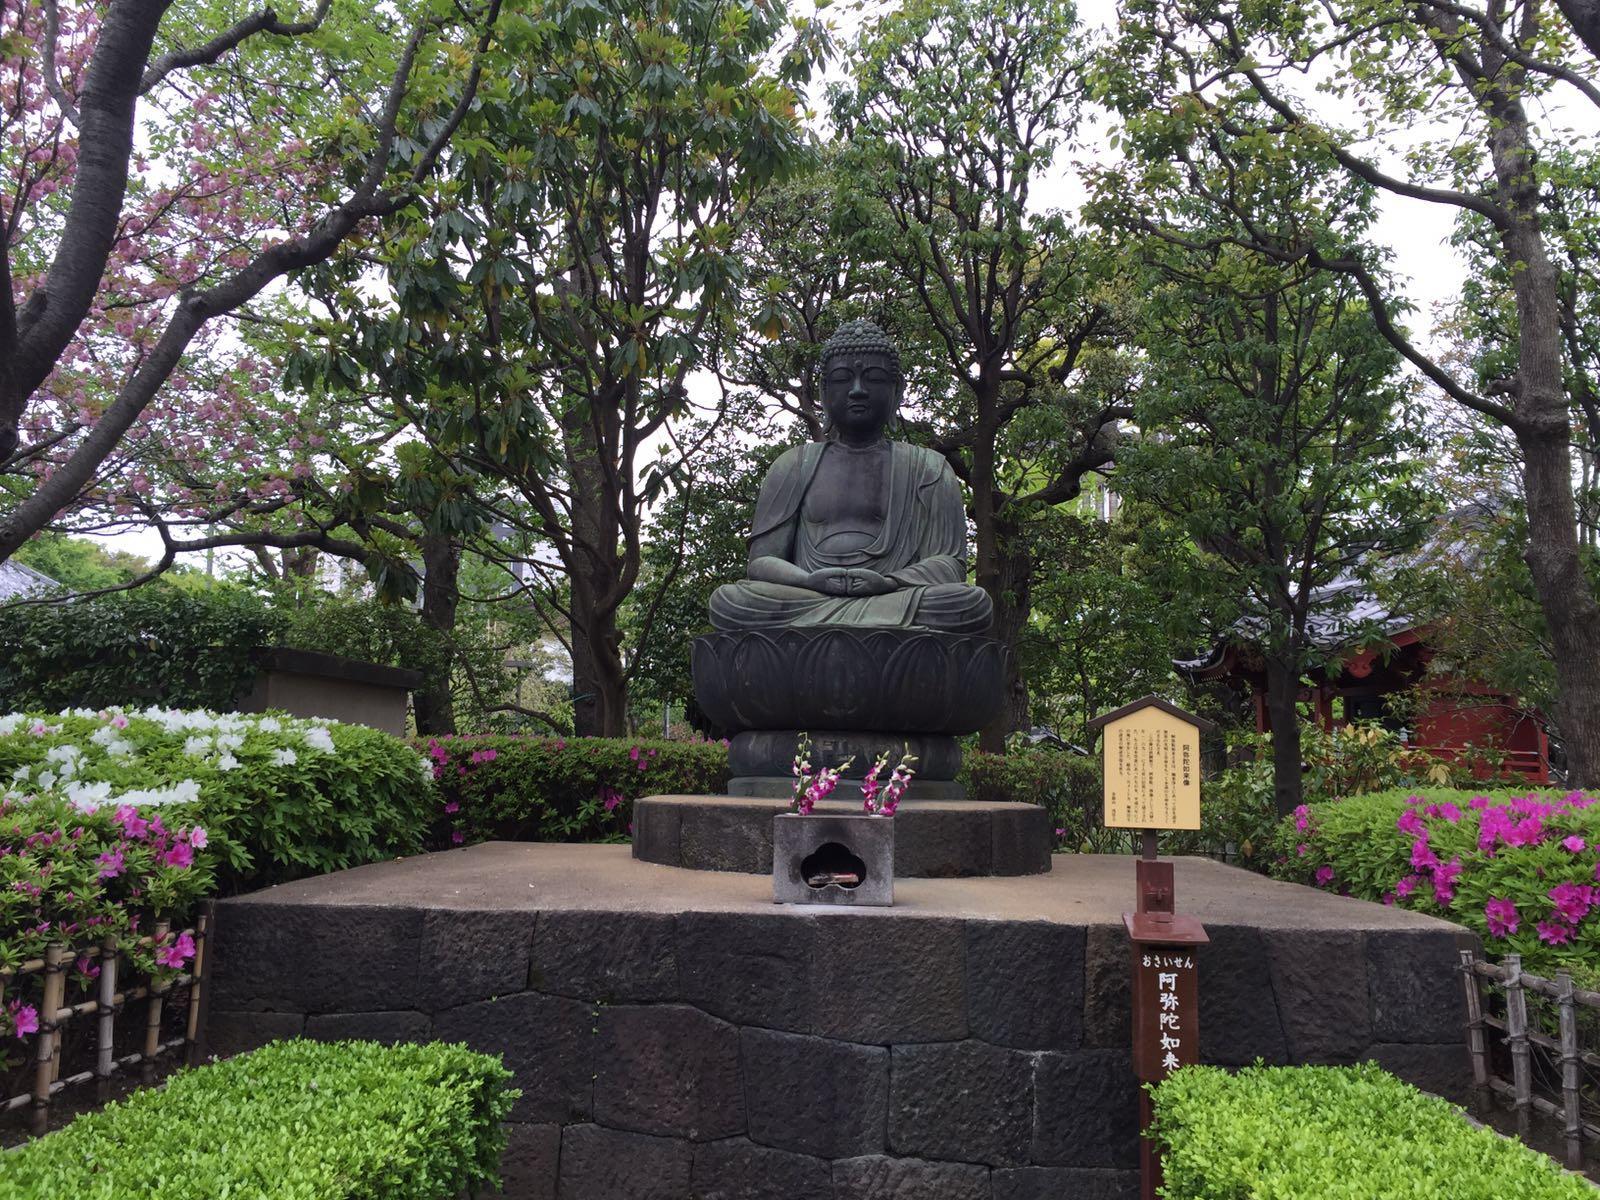 Buddha having a minute